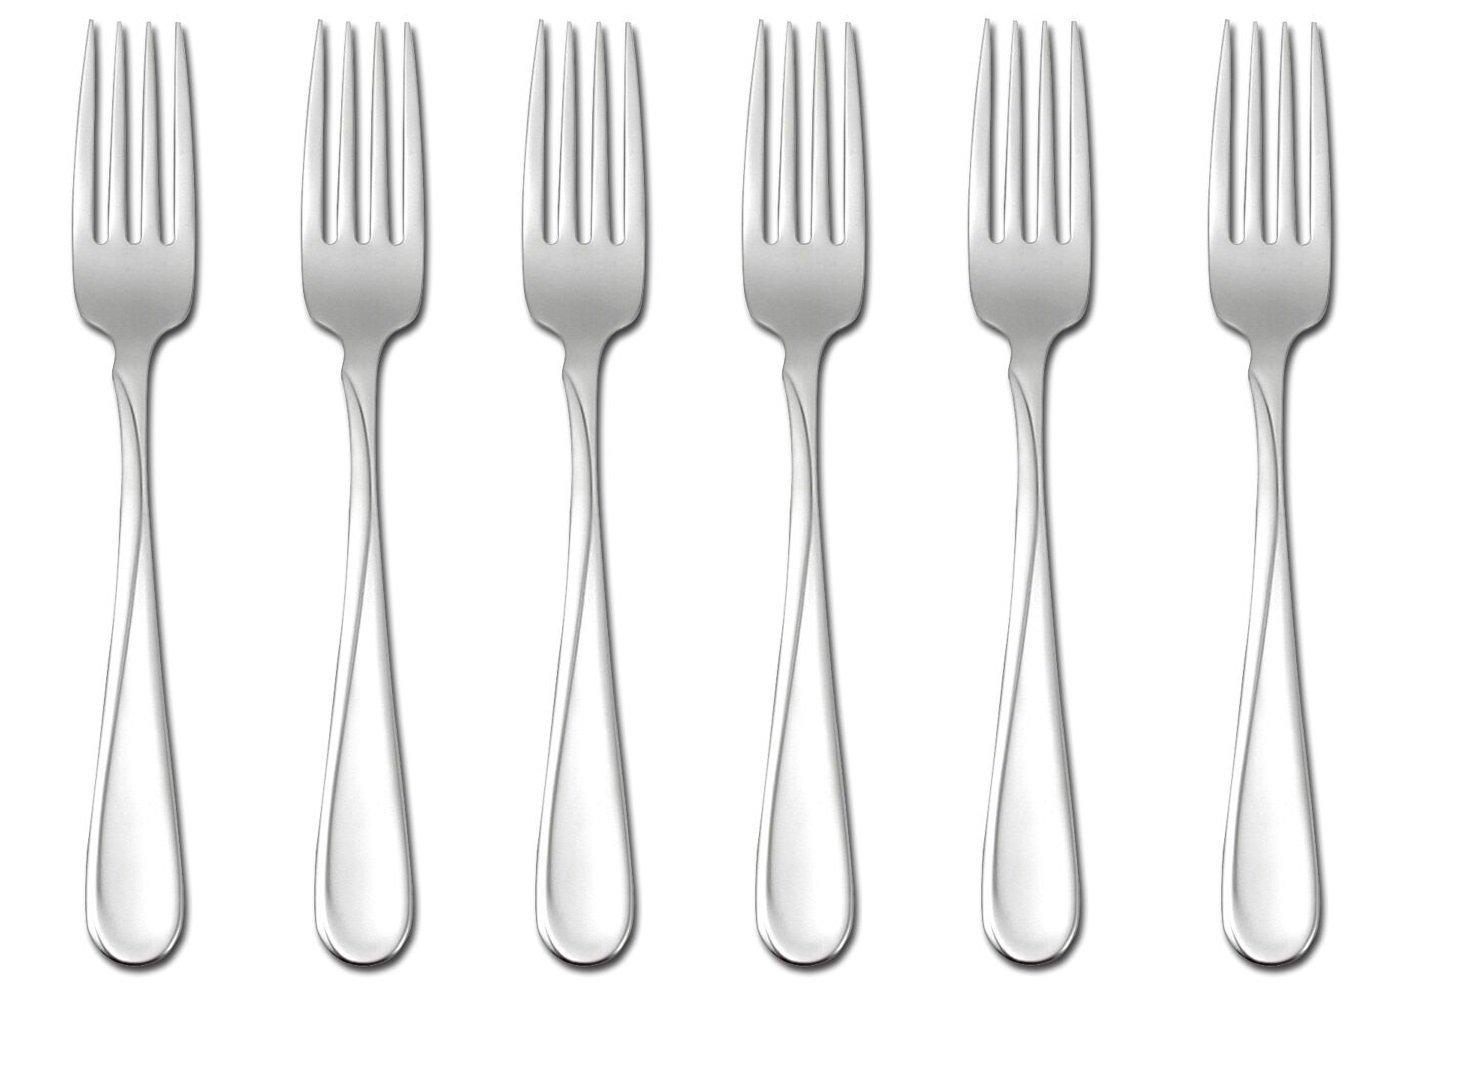 Oneida Flight Dinner Forks, Set of 6